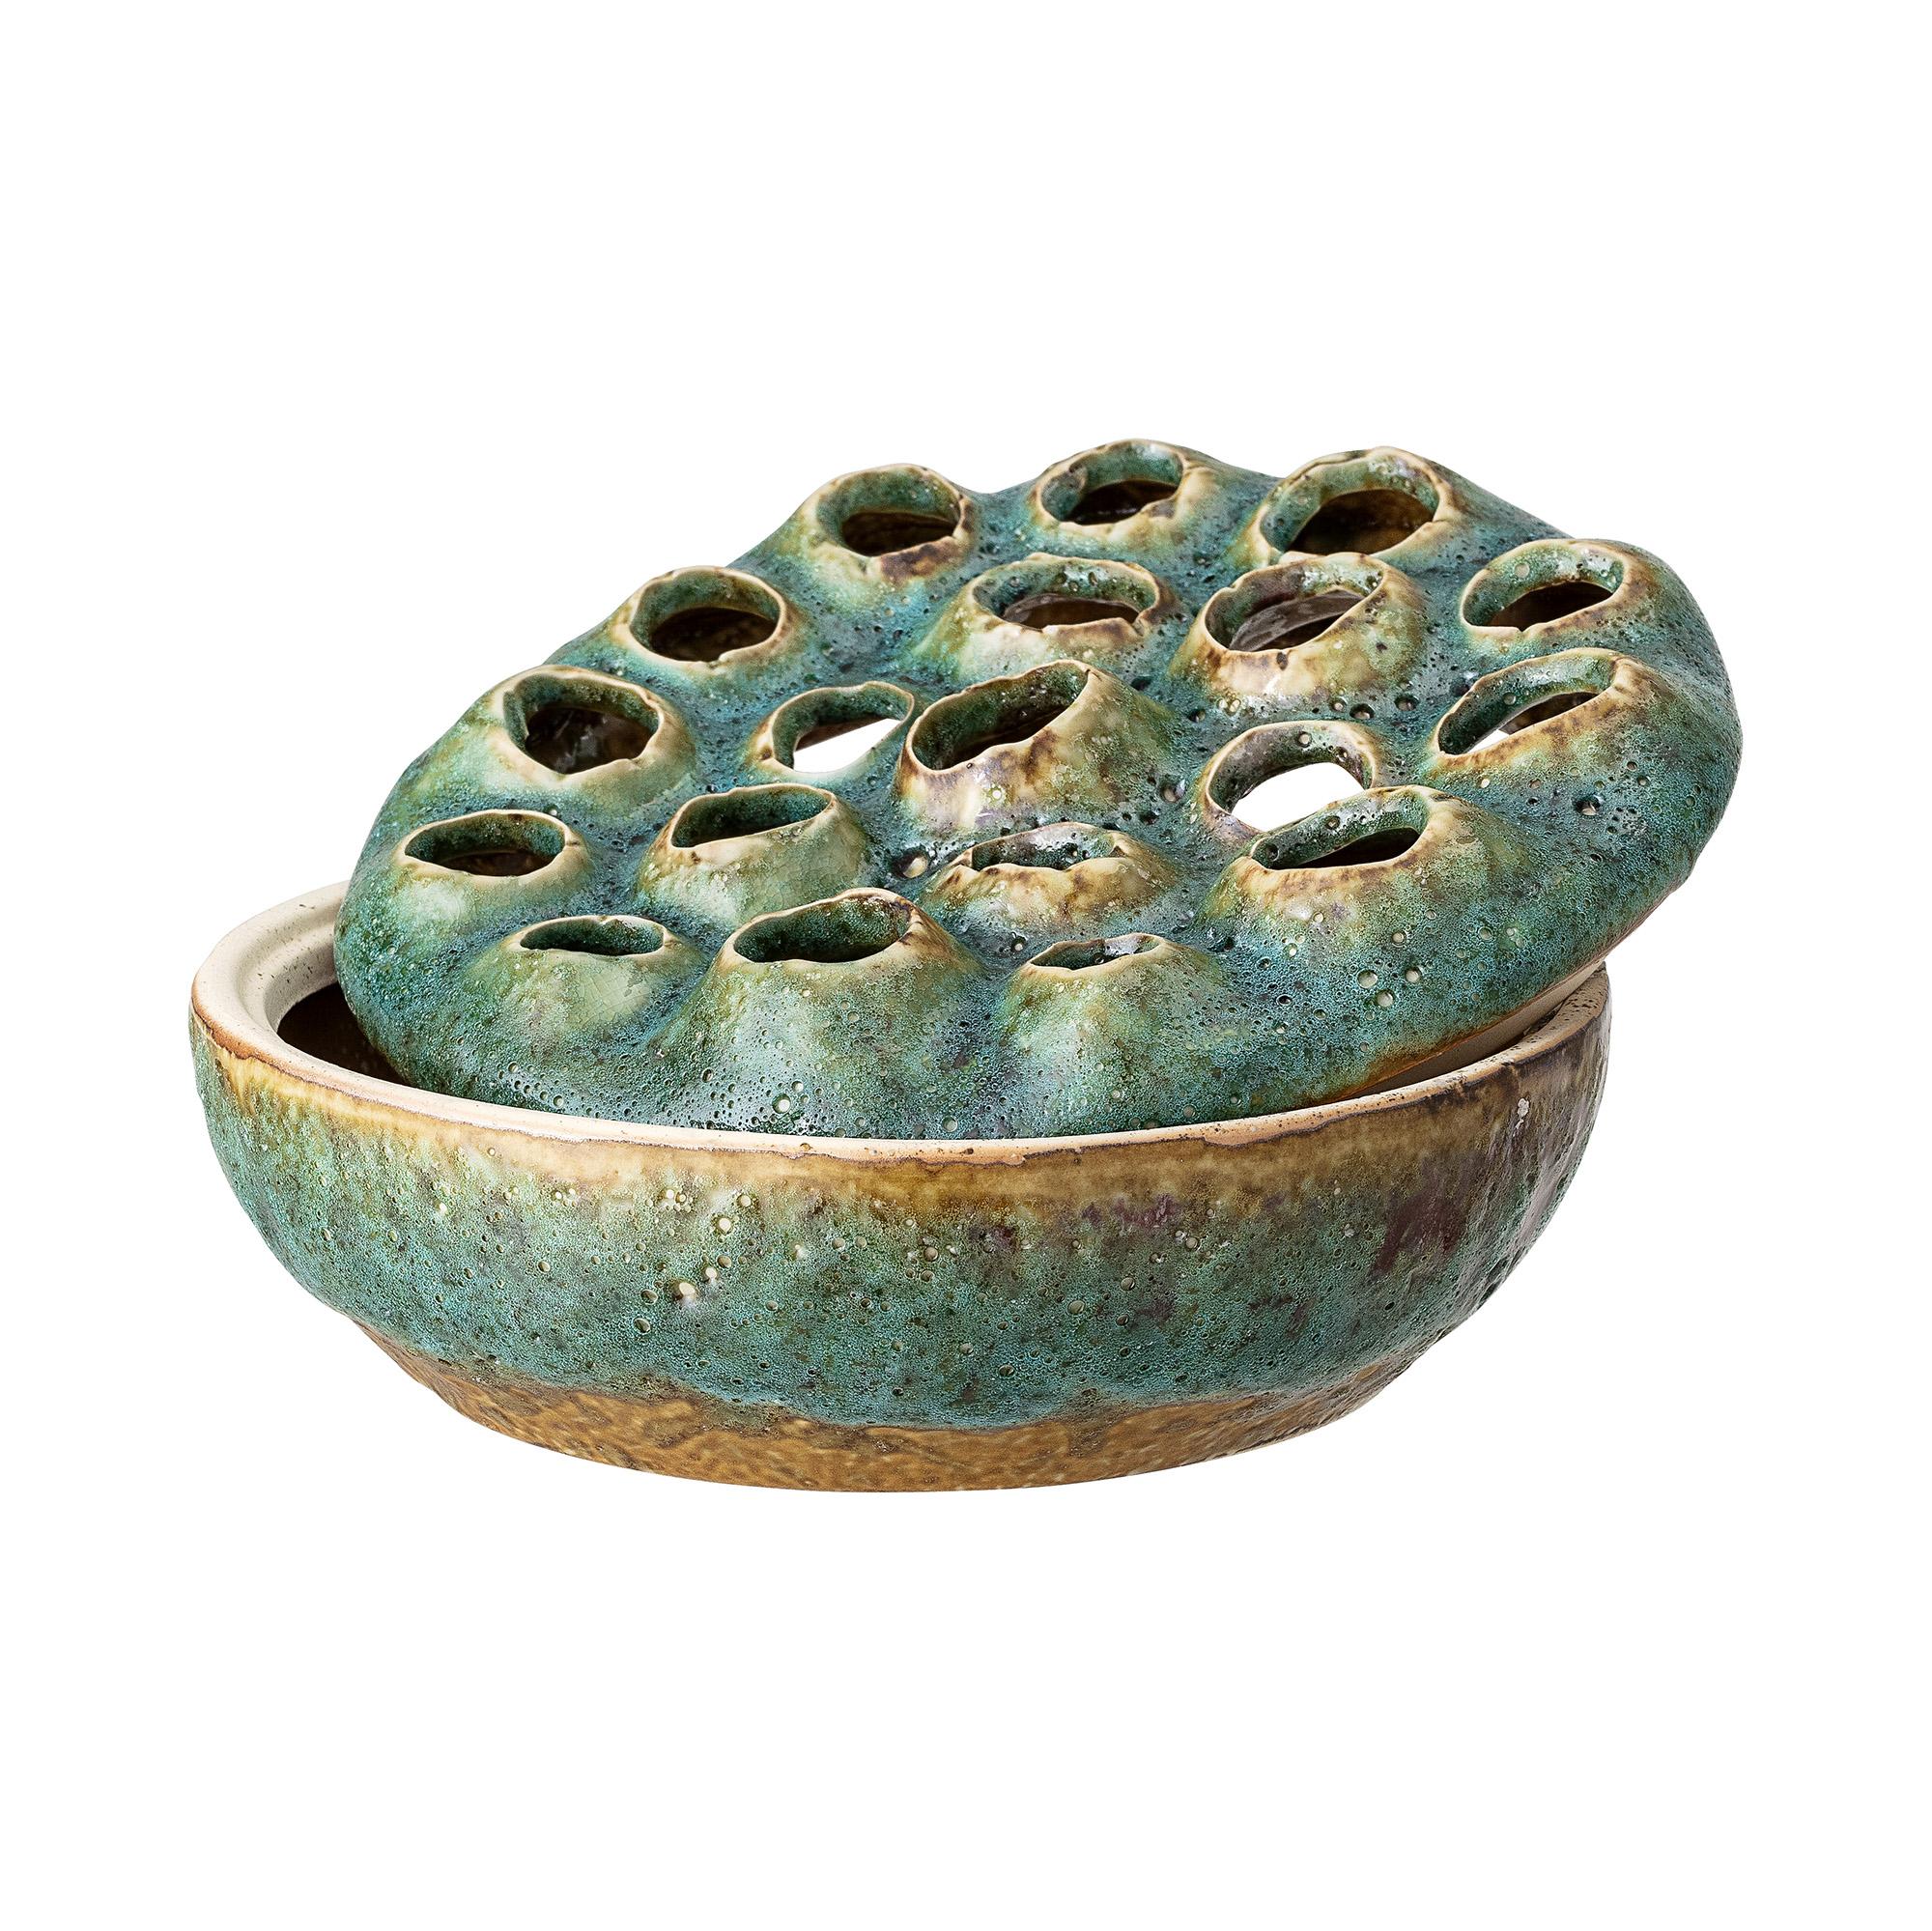 Bloomingville - Stonewear Vase/Bowl Ø 18 cm - Green (82046315)